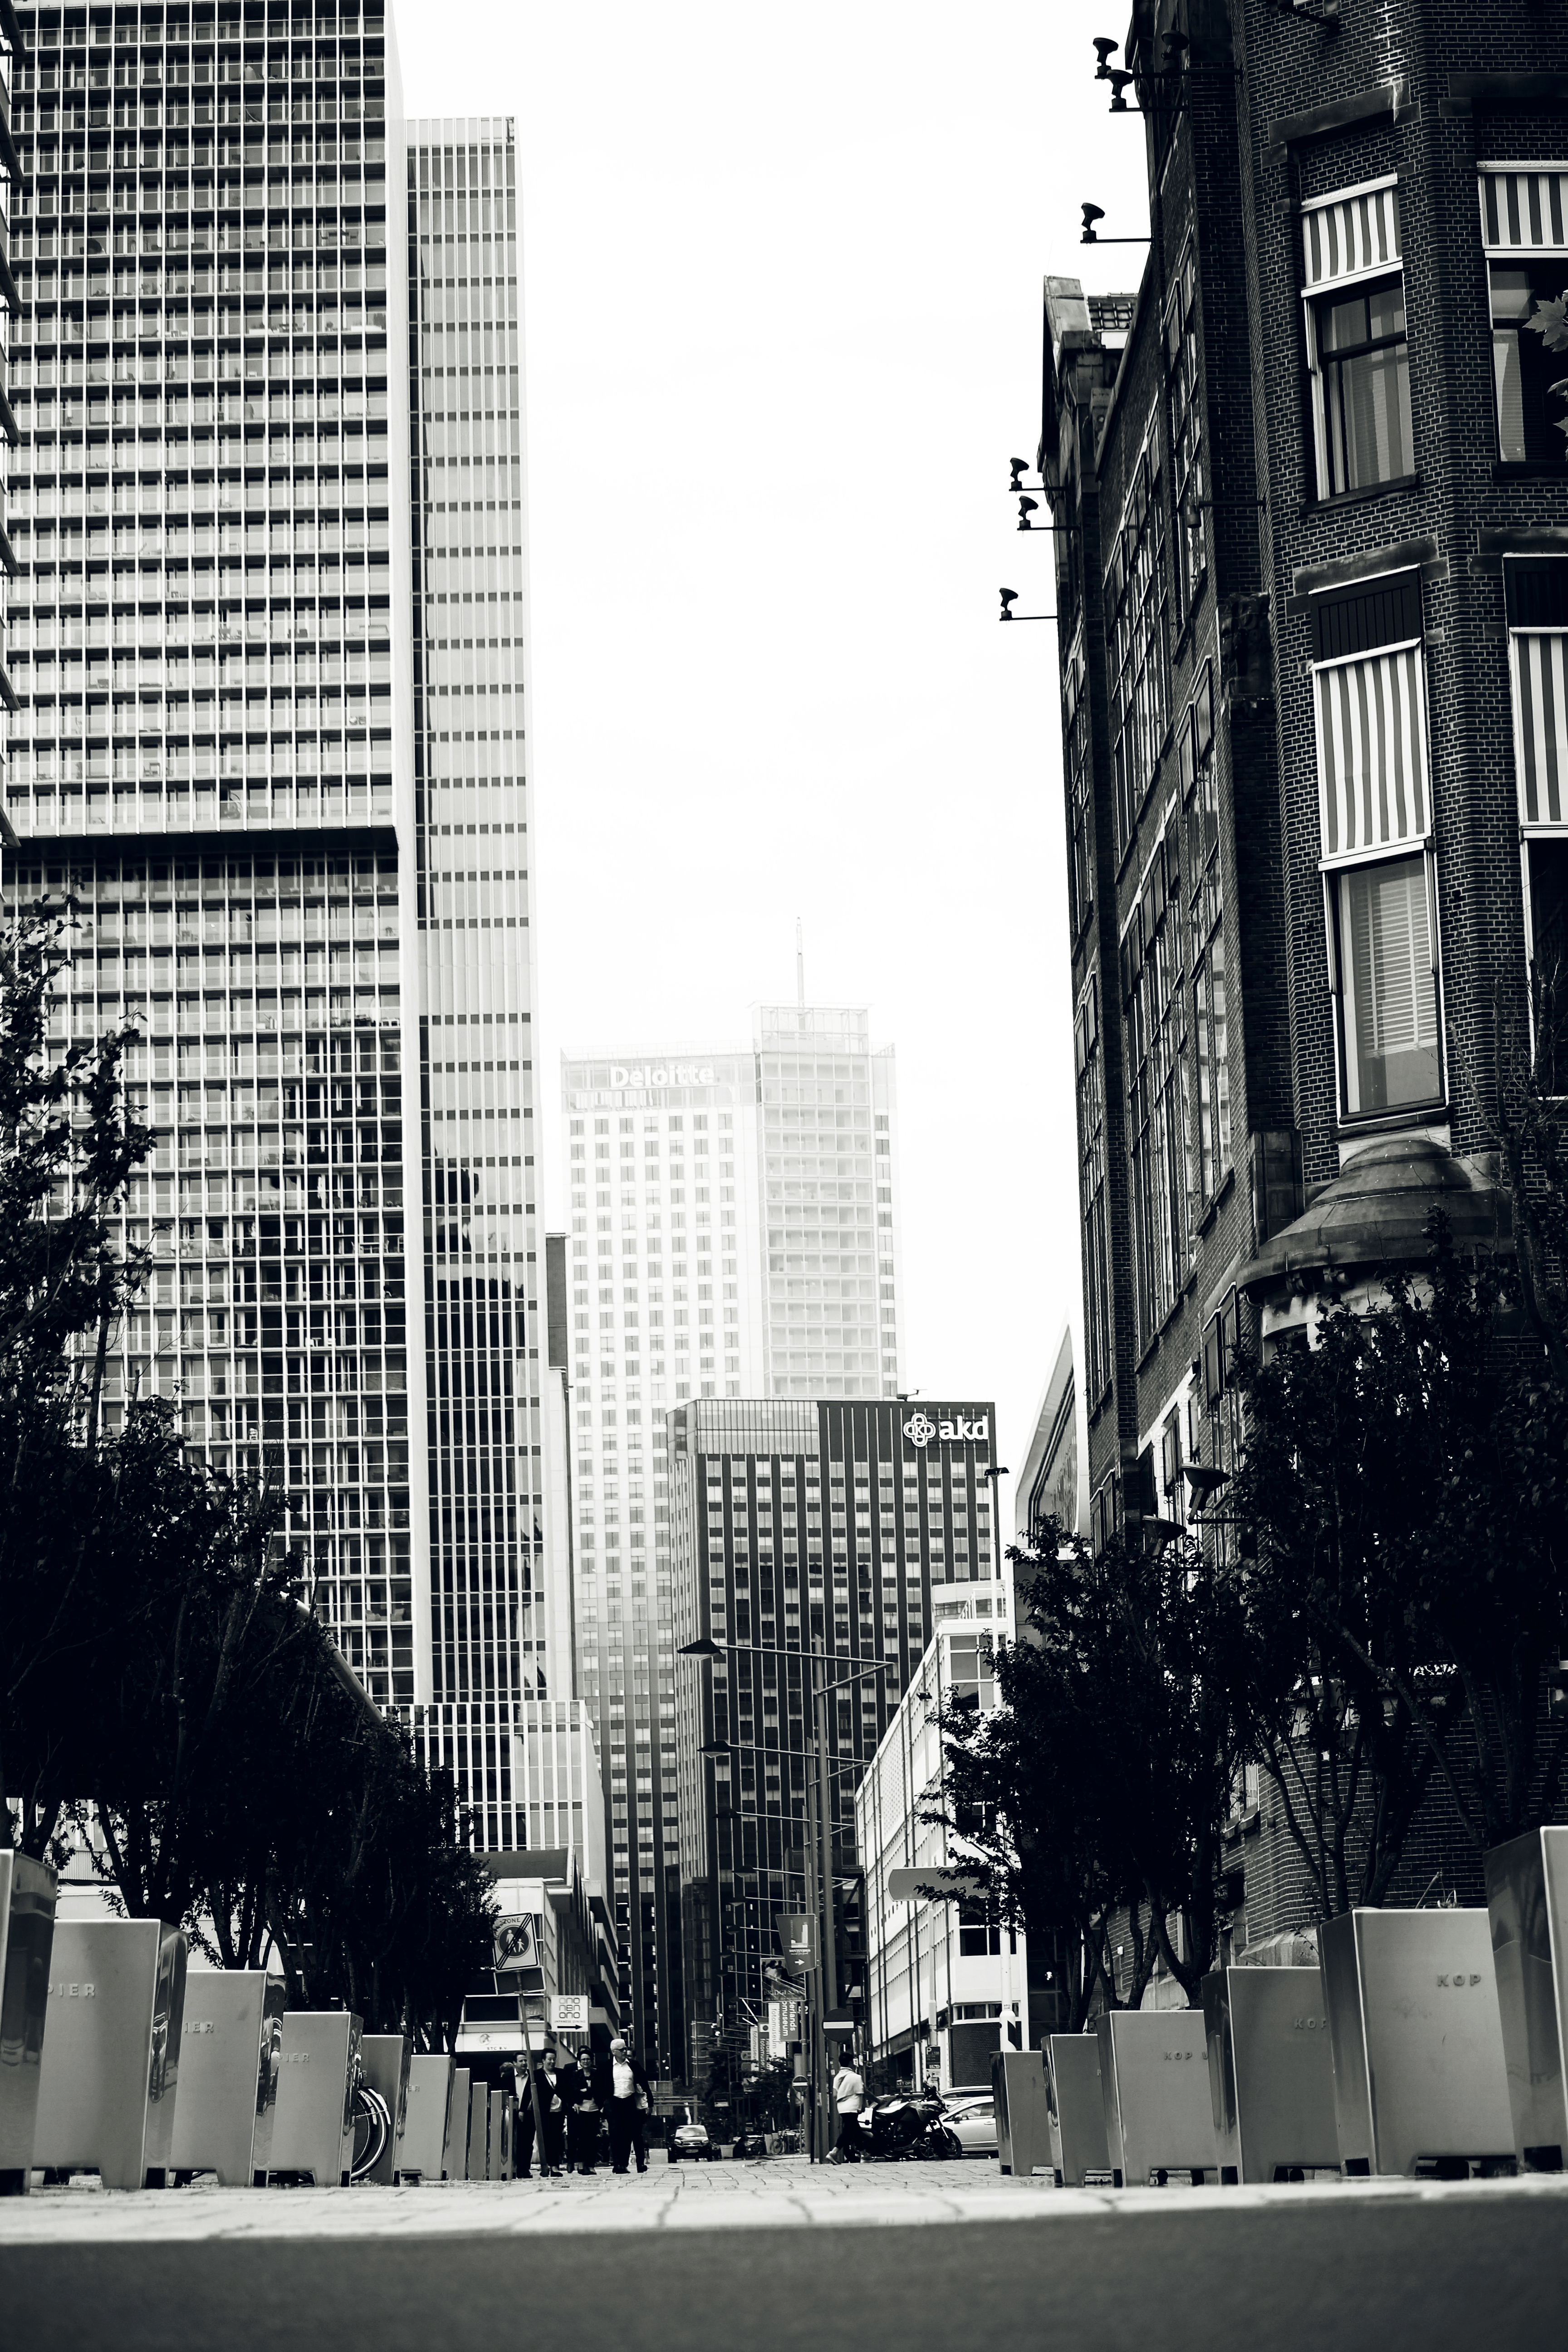 Free stock photo of city, people, landmark, street